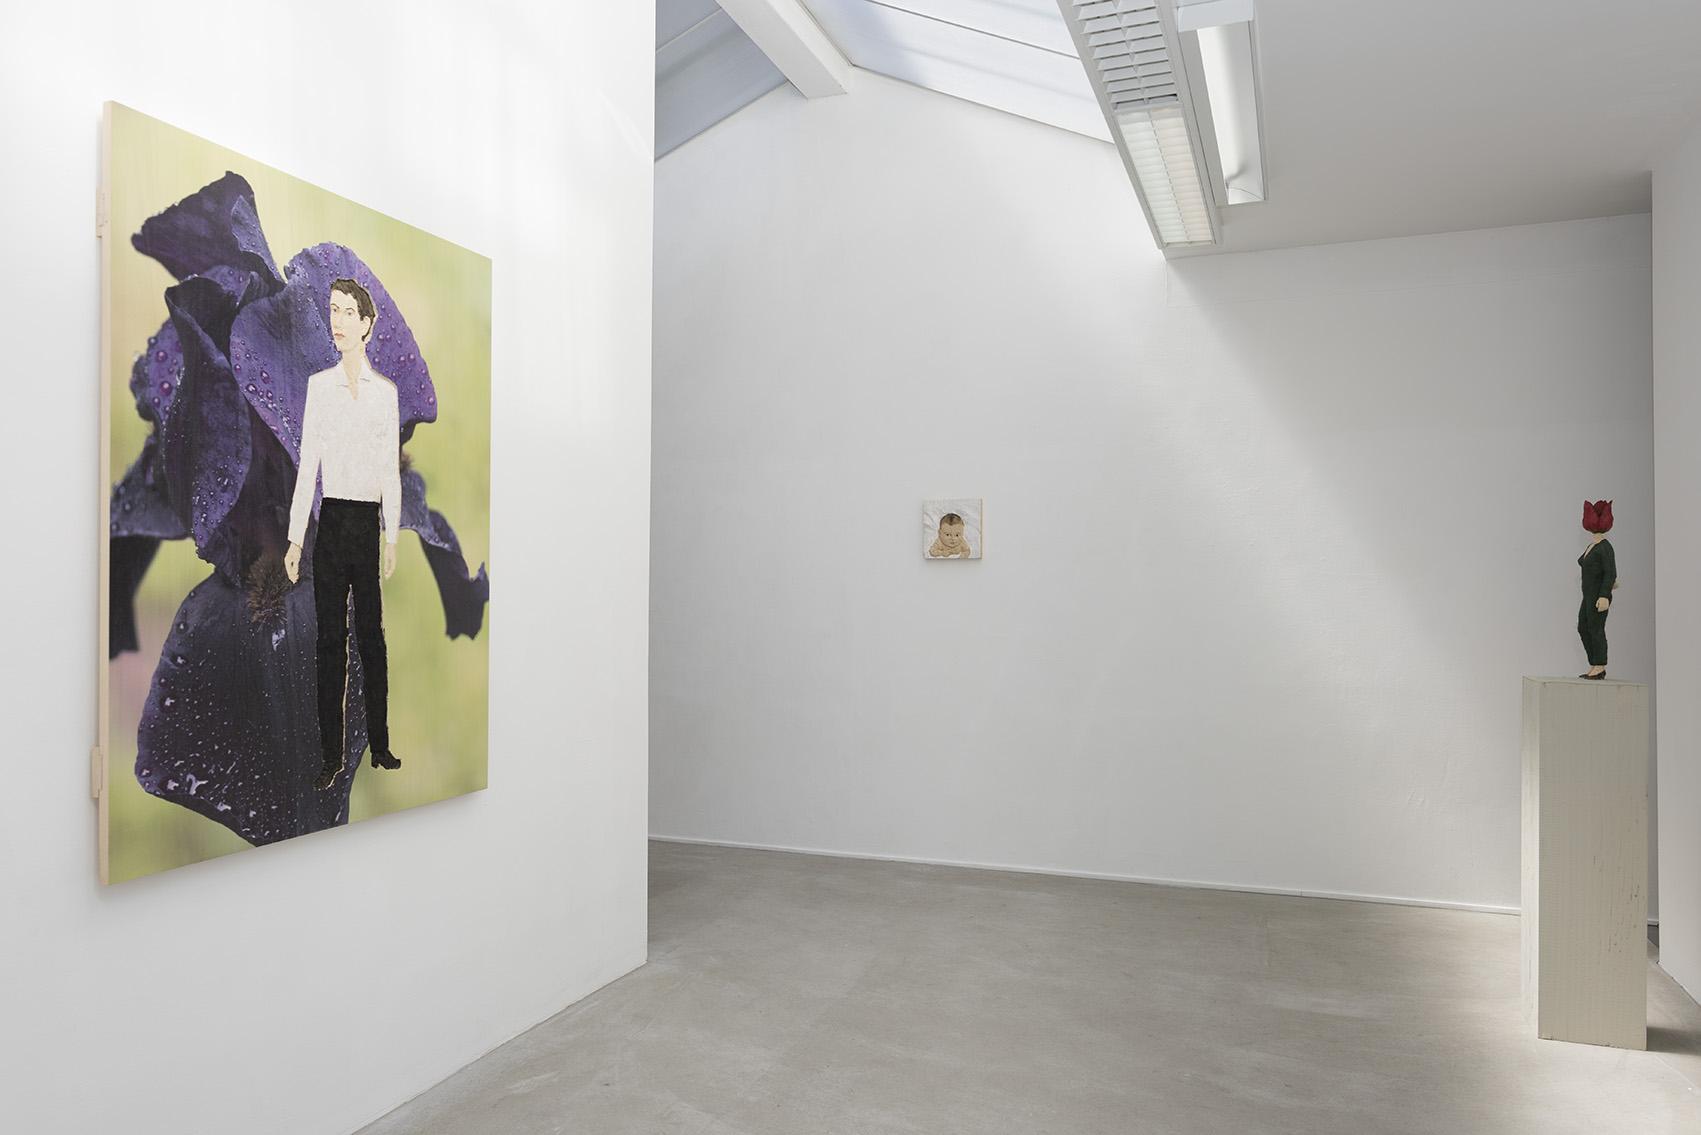 Stephan Balkenhol, installation view IIII,photo Peter Cox, AKINCI, 2015